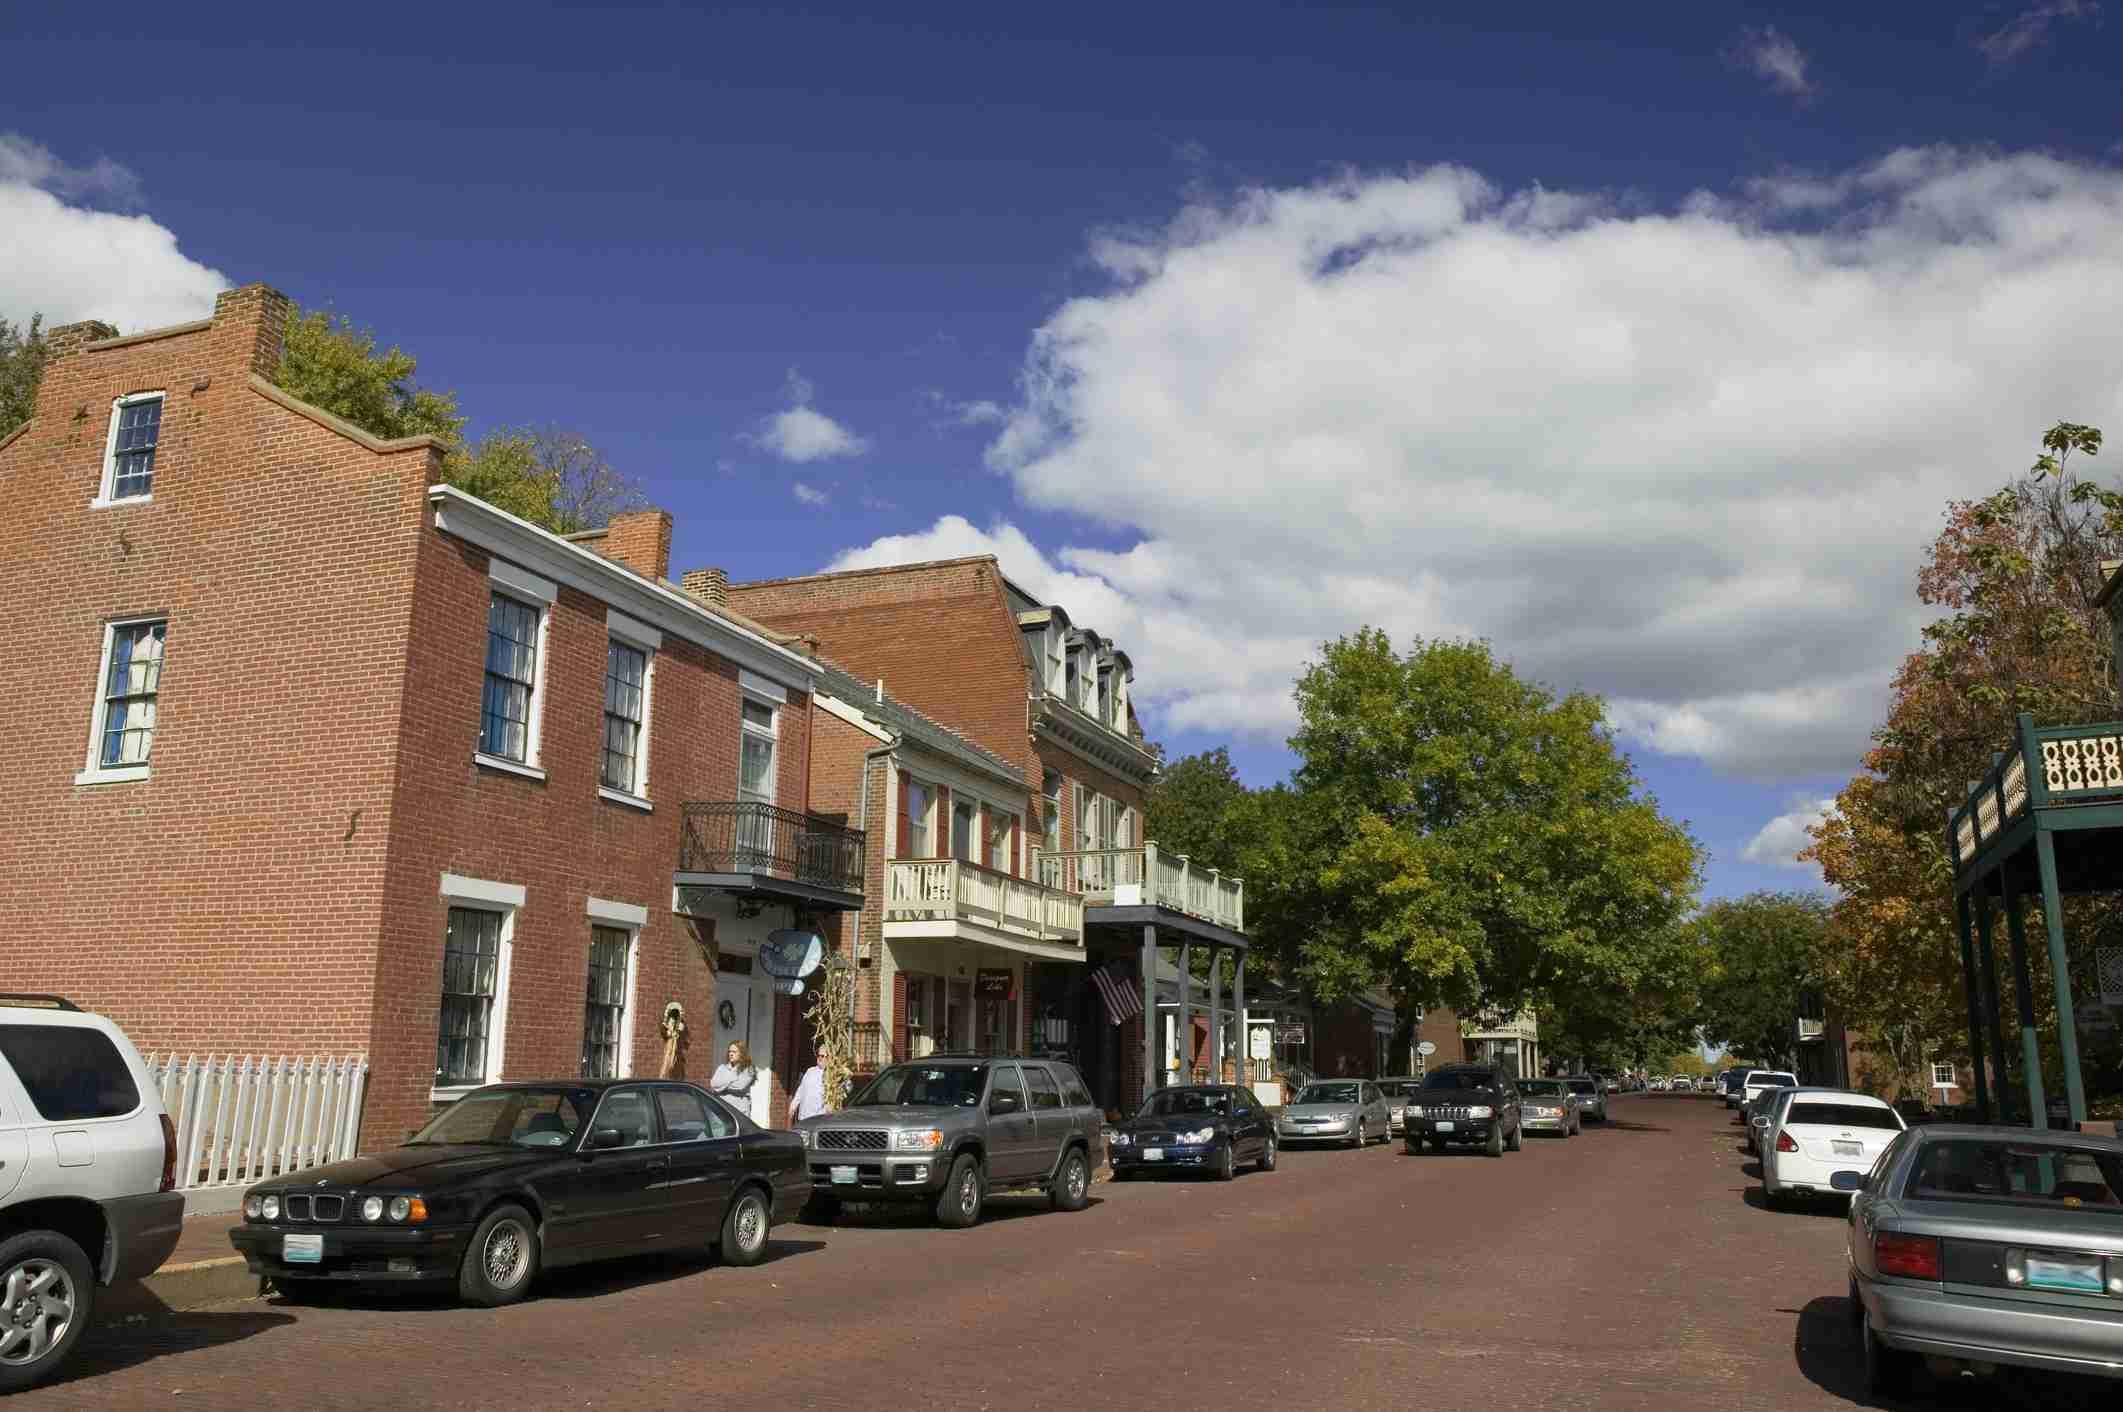 Street in St. Charles, Missouri